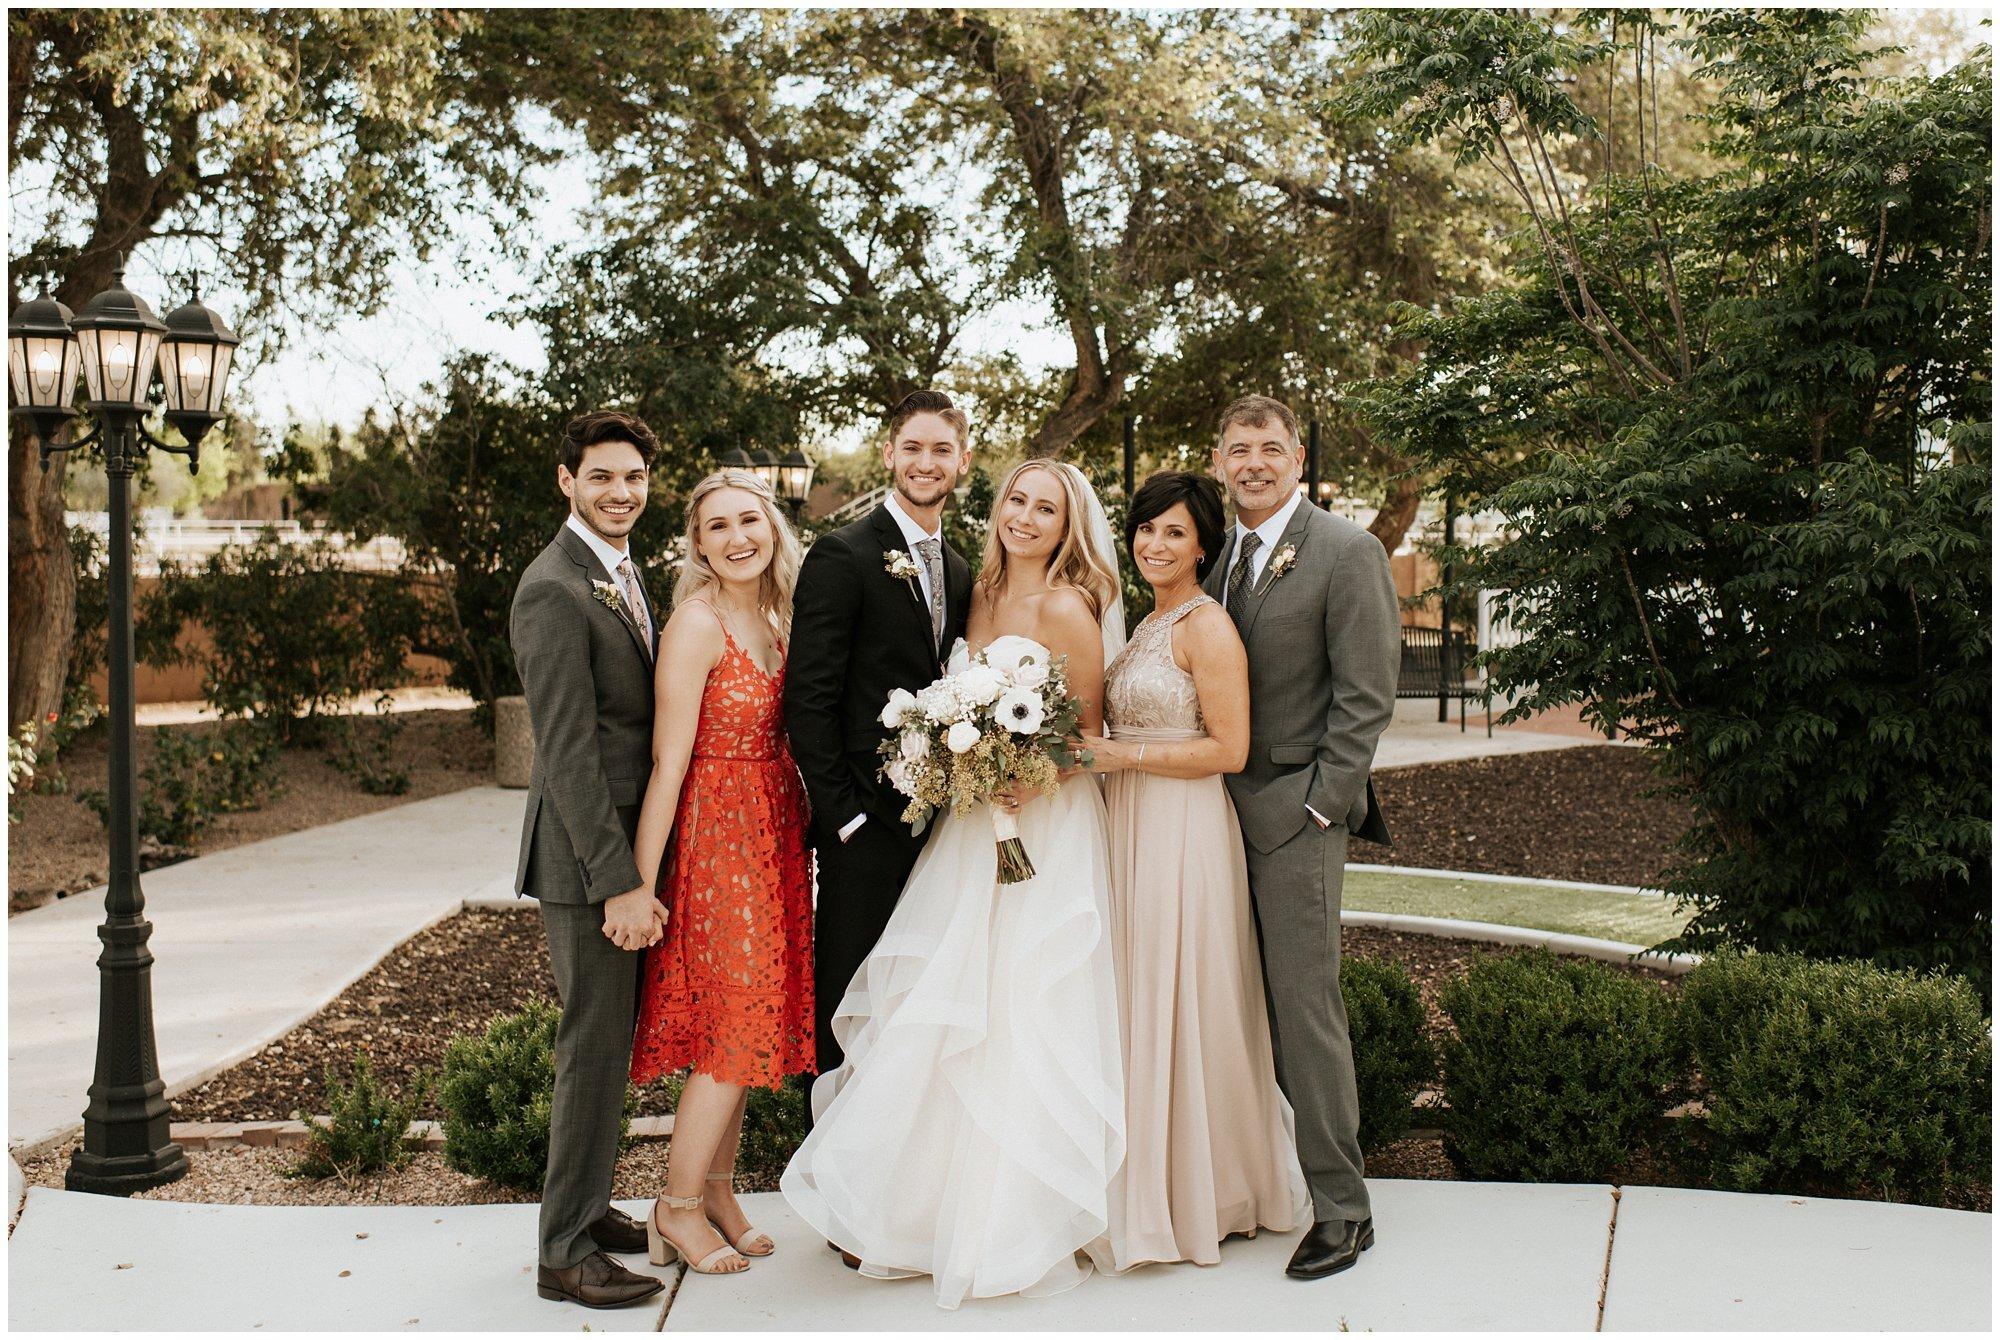 Wedgewood_Lindsay_Groves-Arizona-Wedding-Photographer-M+C_0039.jpg